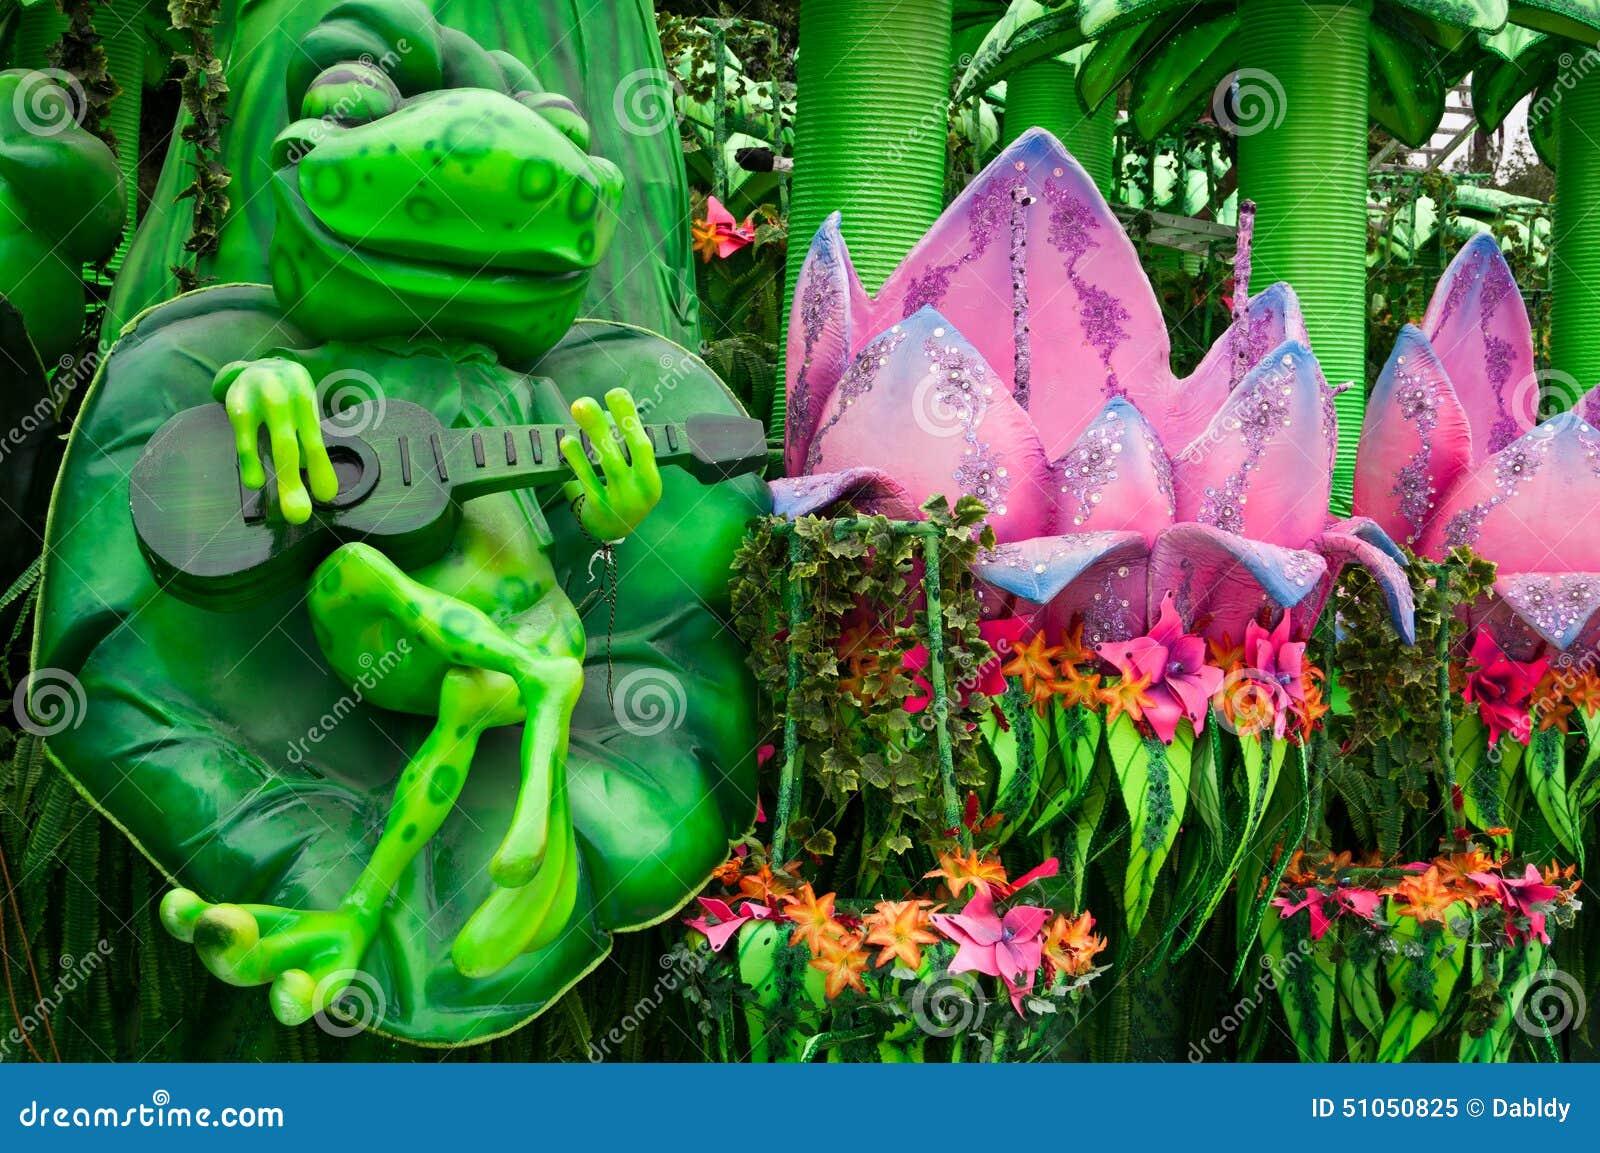 rio carnival float decorations - Float Decorations